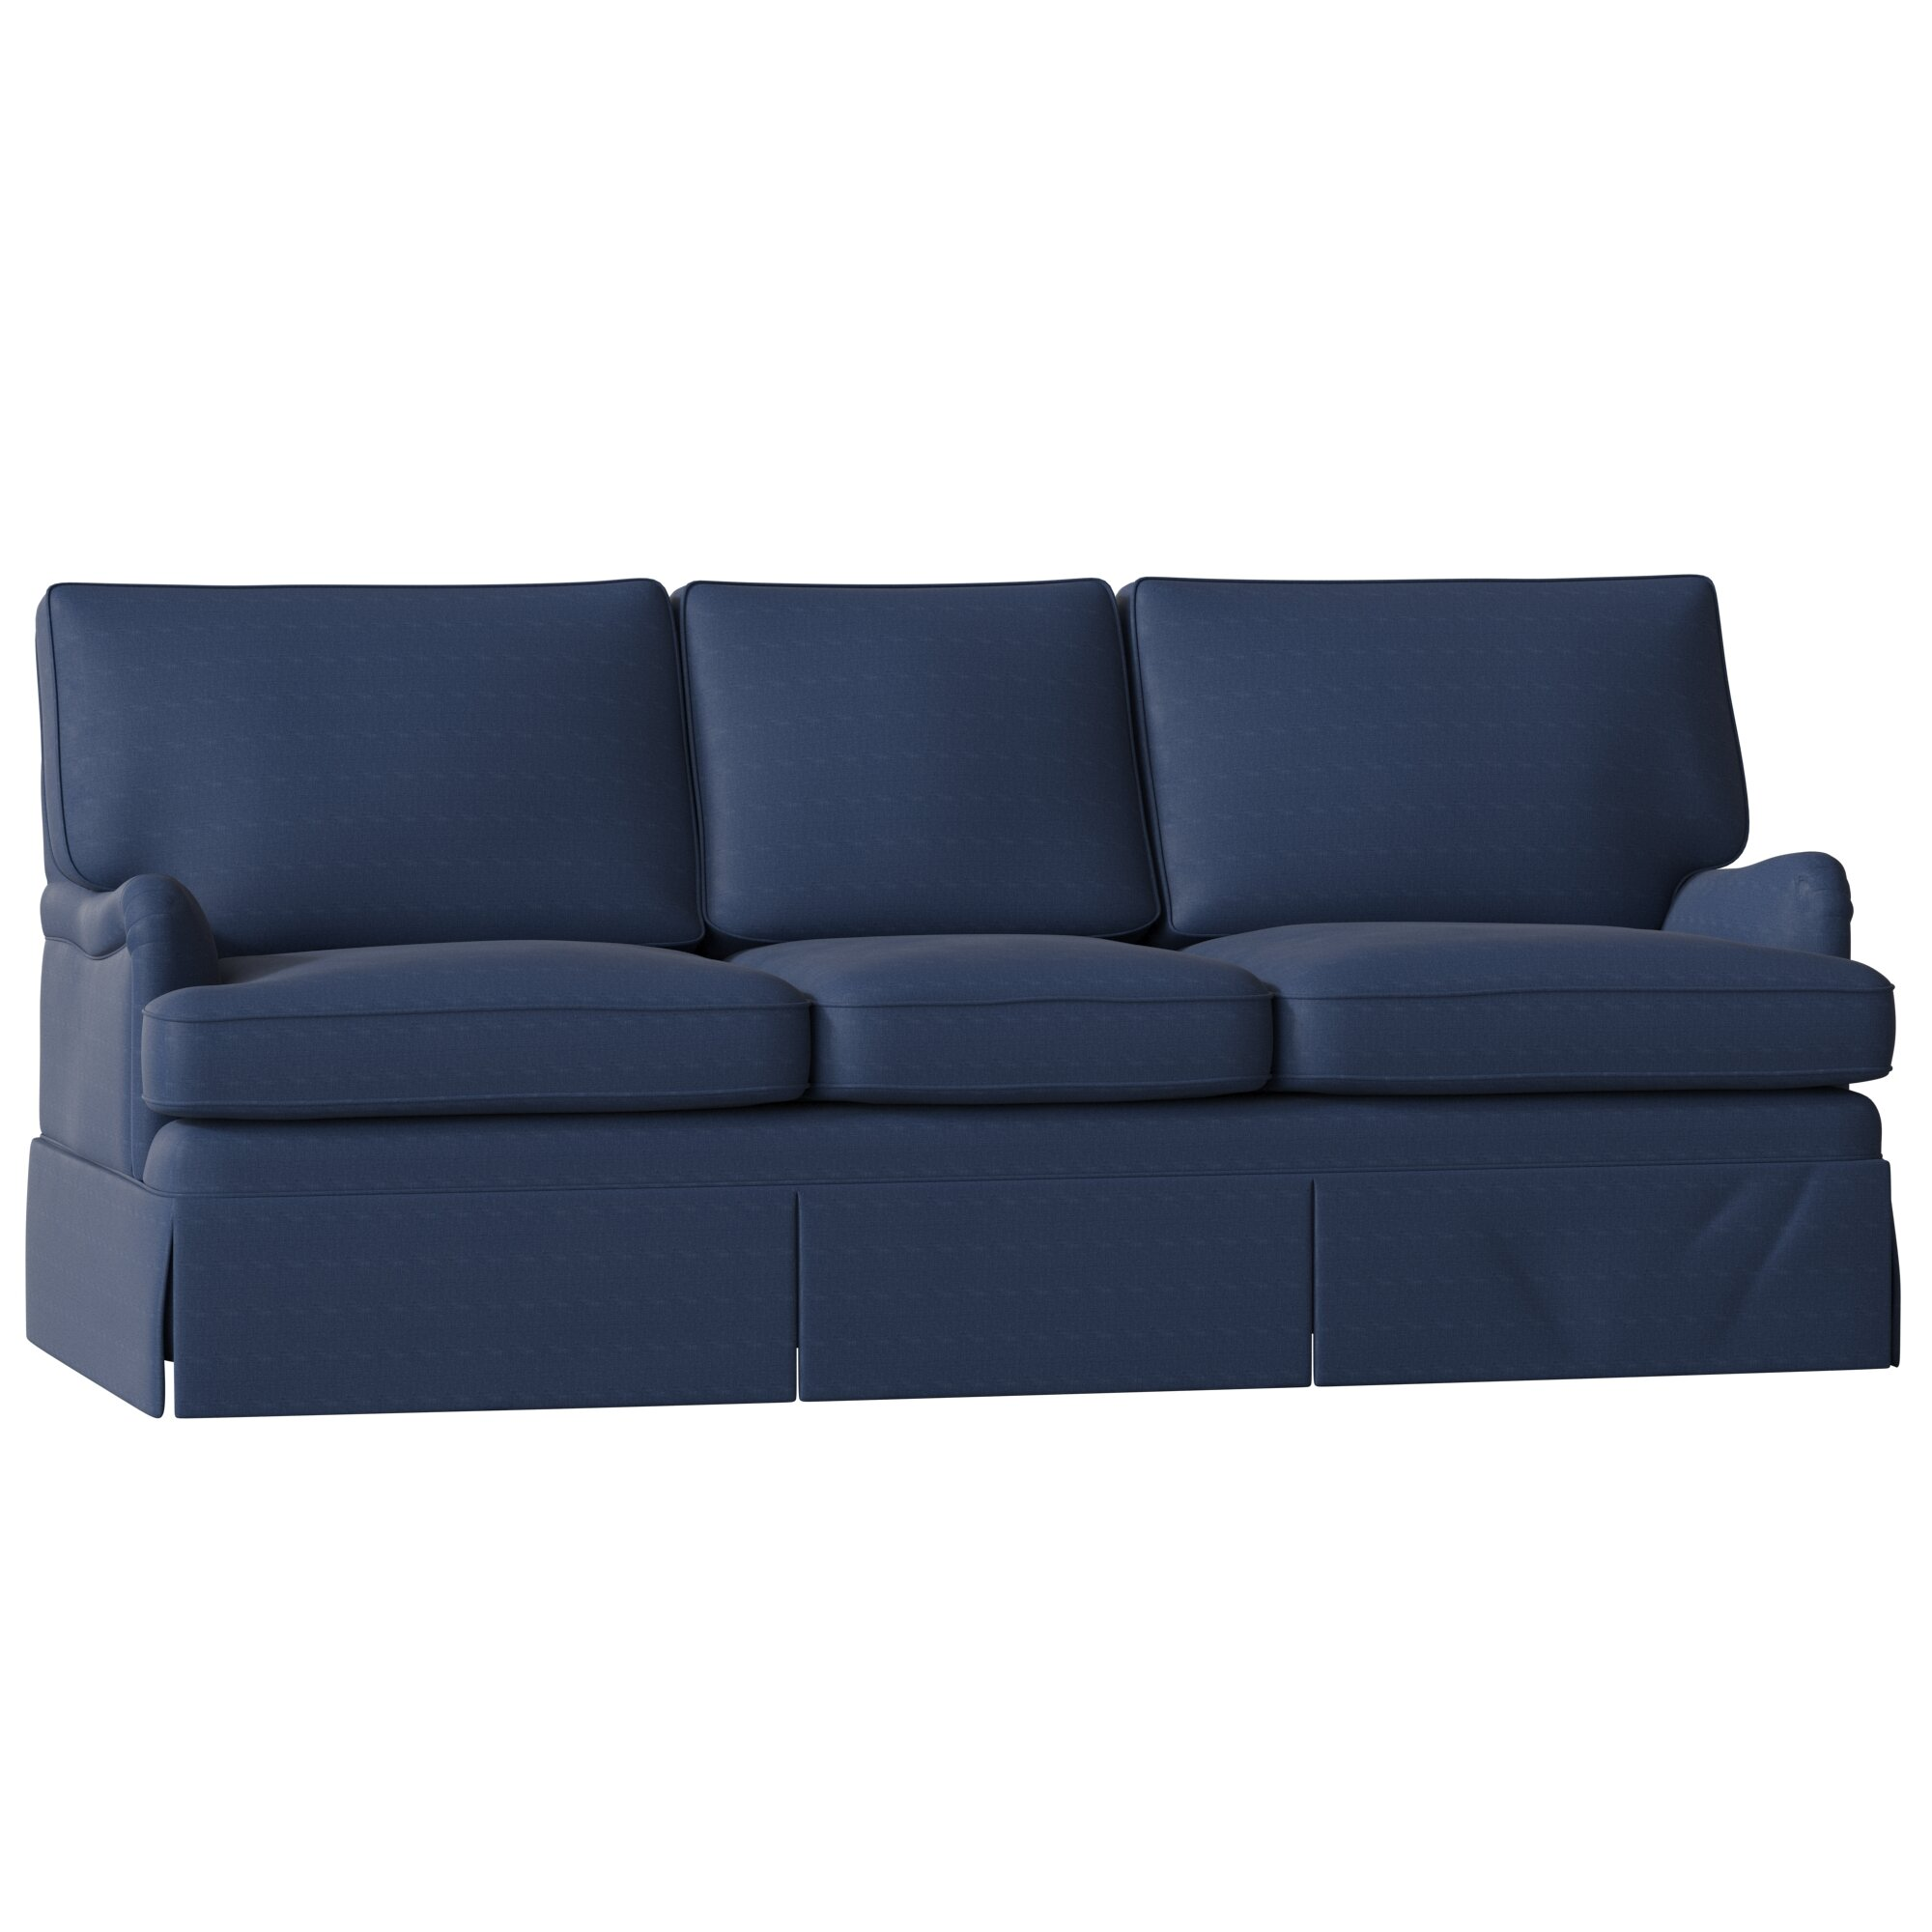 Superb London Sleeper Sofa Machost Co Dining Chair Design Ideas Machostcouk